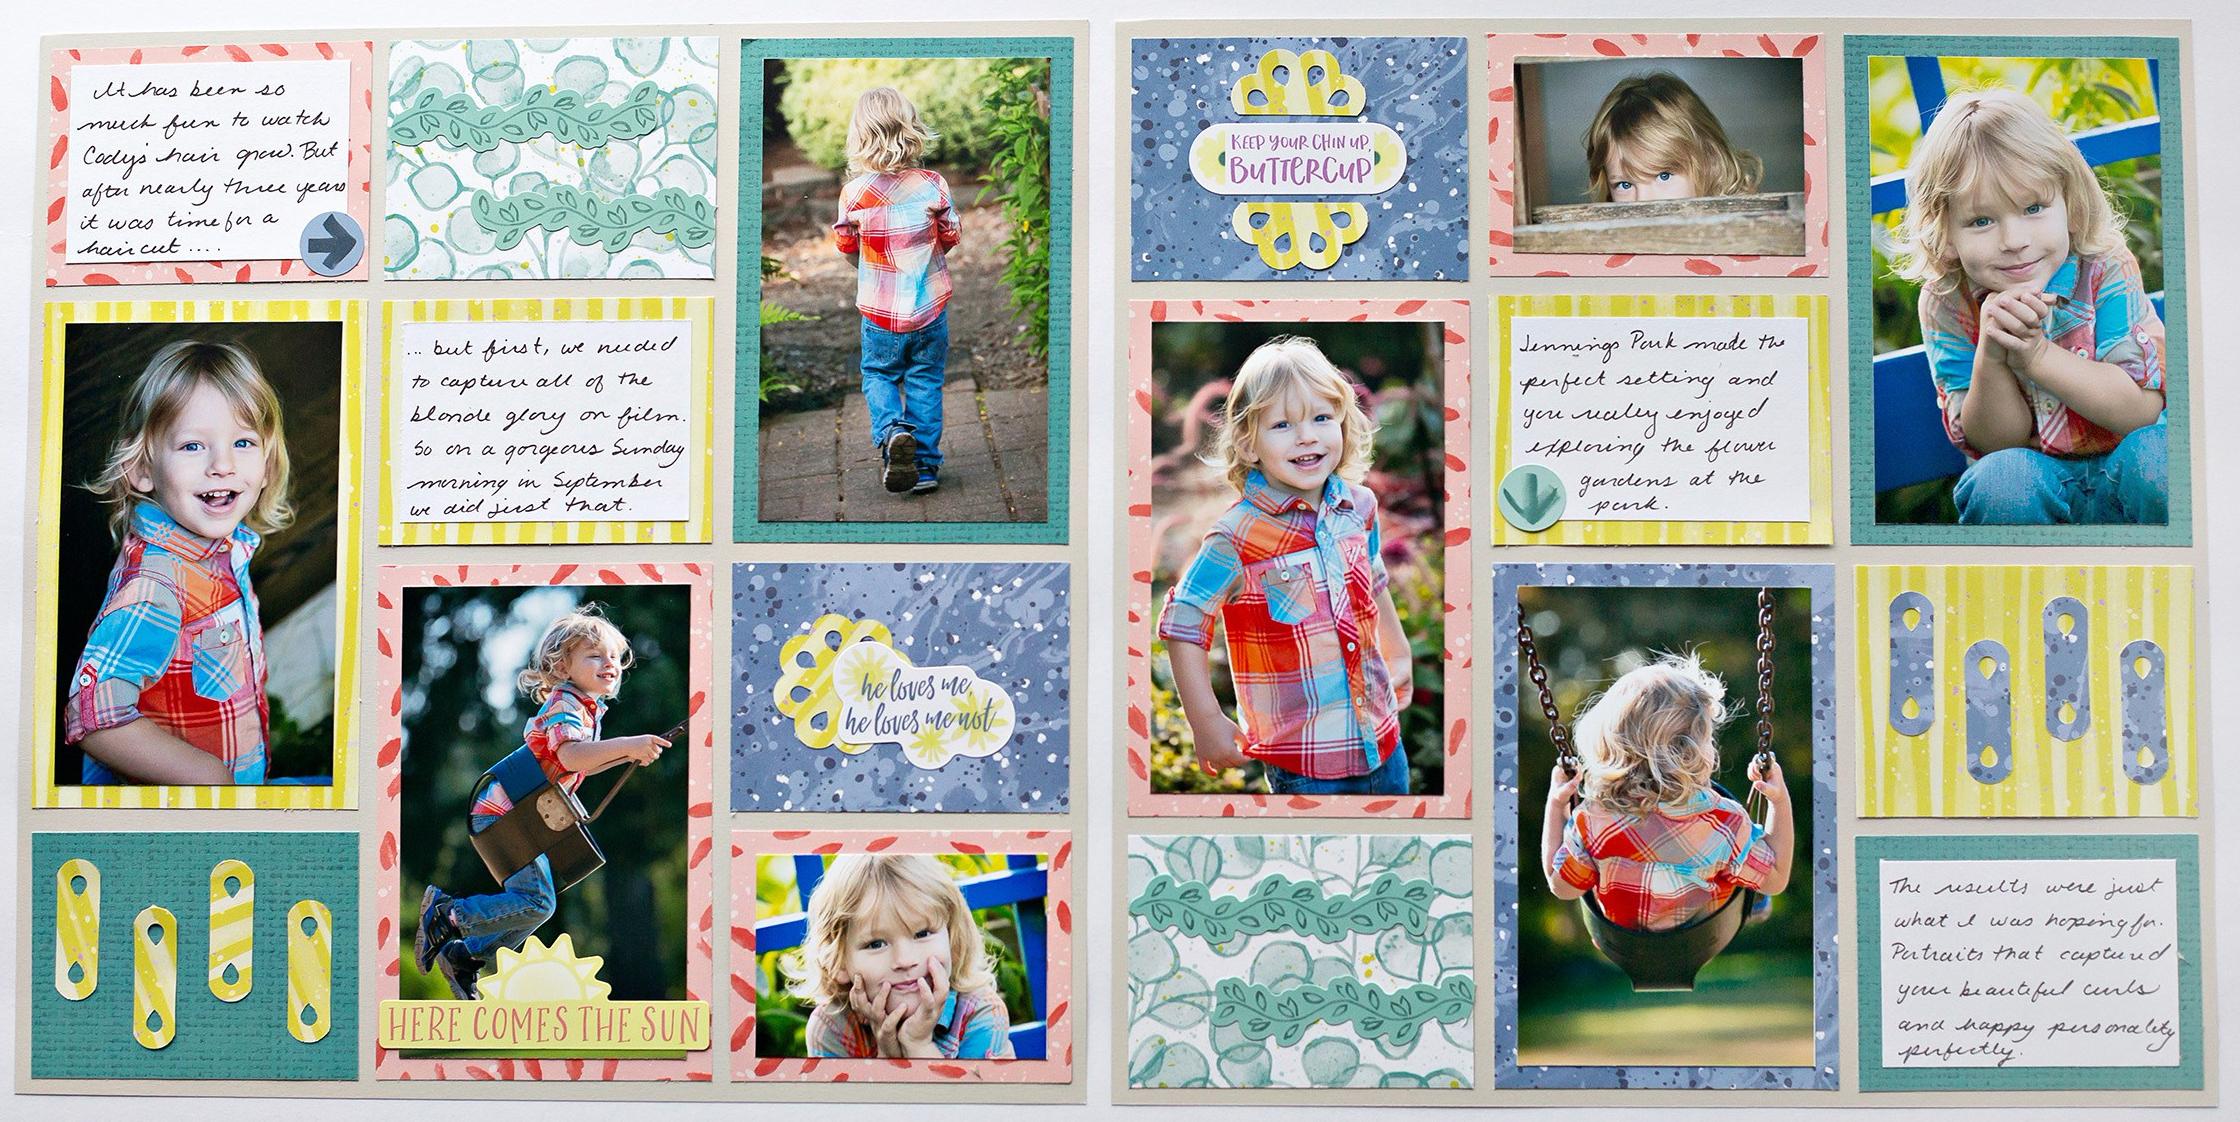 Throwback-Thursday-Scrapbook-Sketch-Full-Bloom-Layout-Creative-Memories